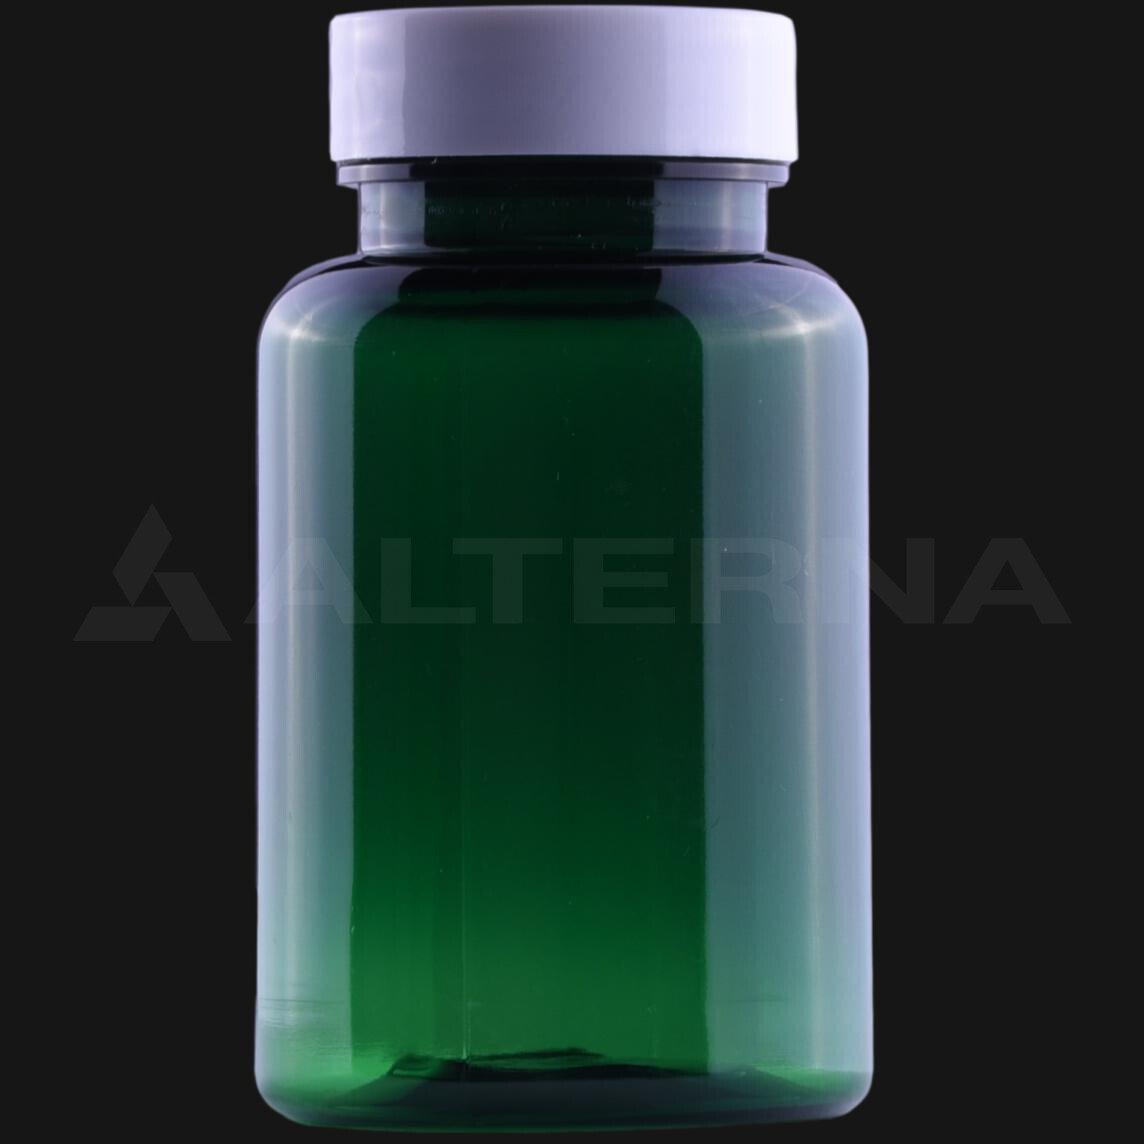 150 ml PET Pill Bottle with 38 mm Alu. Foil Seal Cap